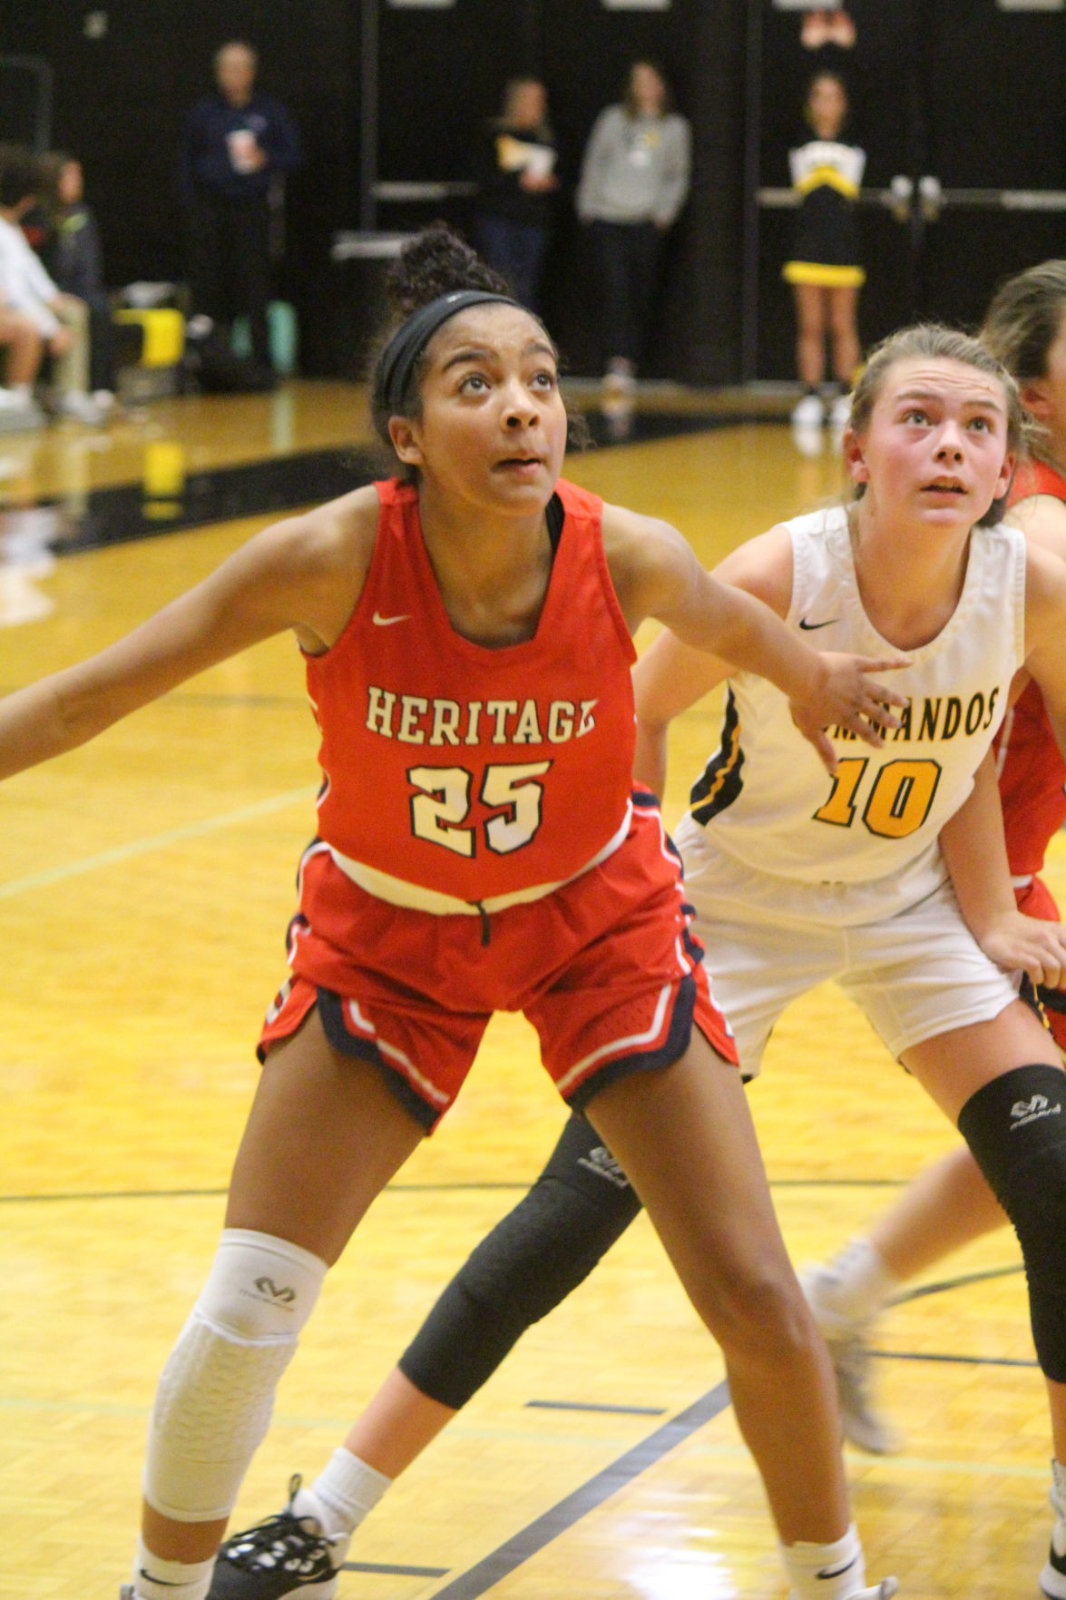 HS Girls Basketball: MSP-Lady Patriots dominate Hendersonville 59-29